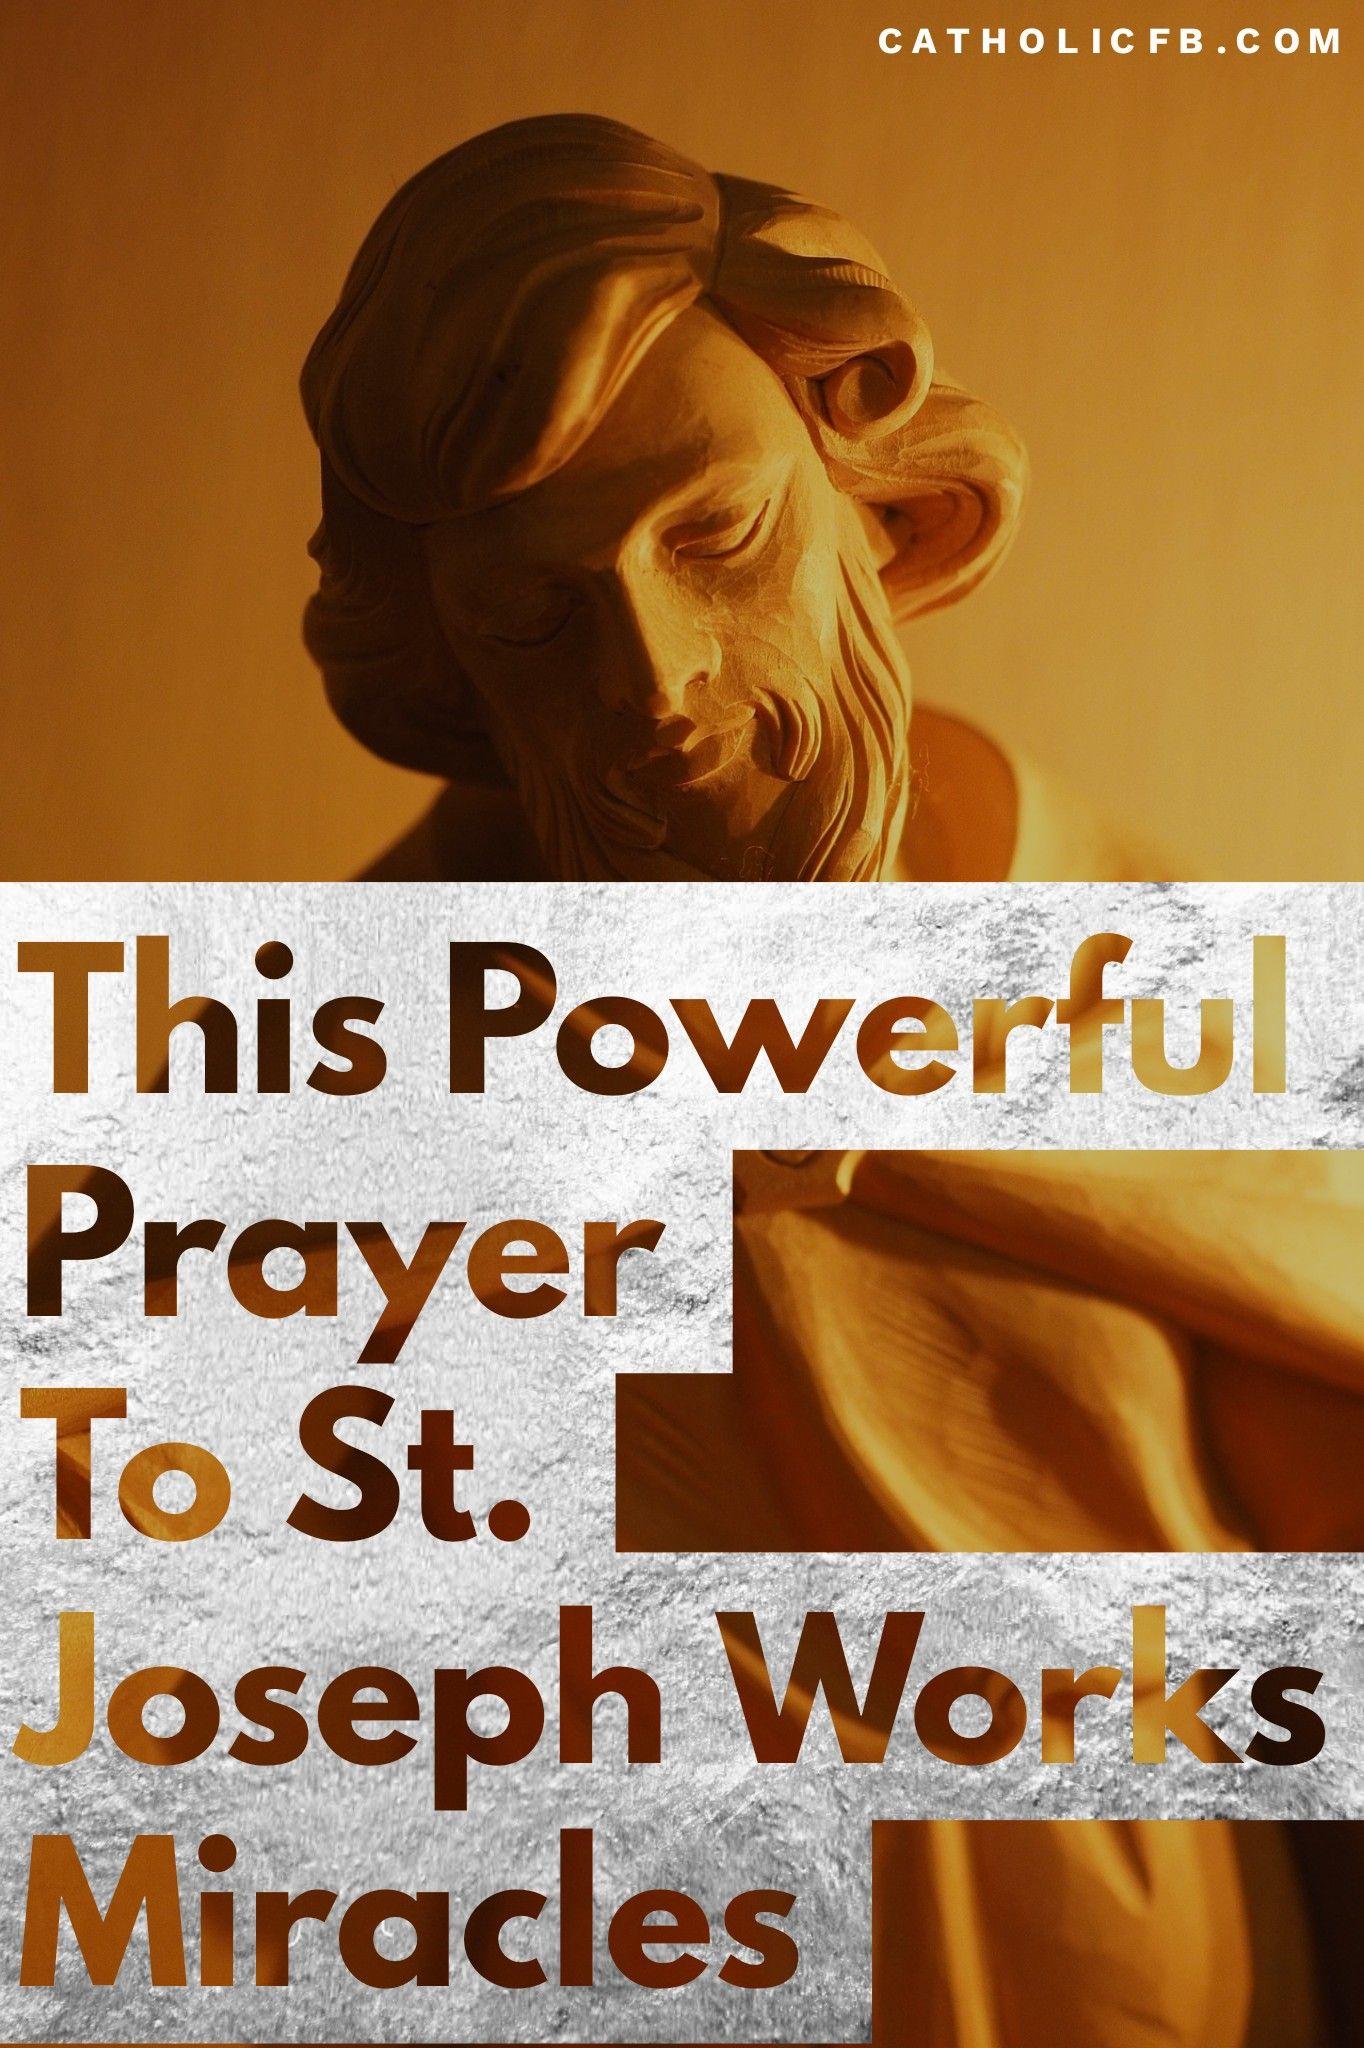 Pin by john burke on faith power of prayer catholic